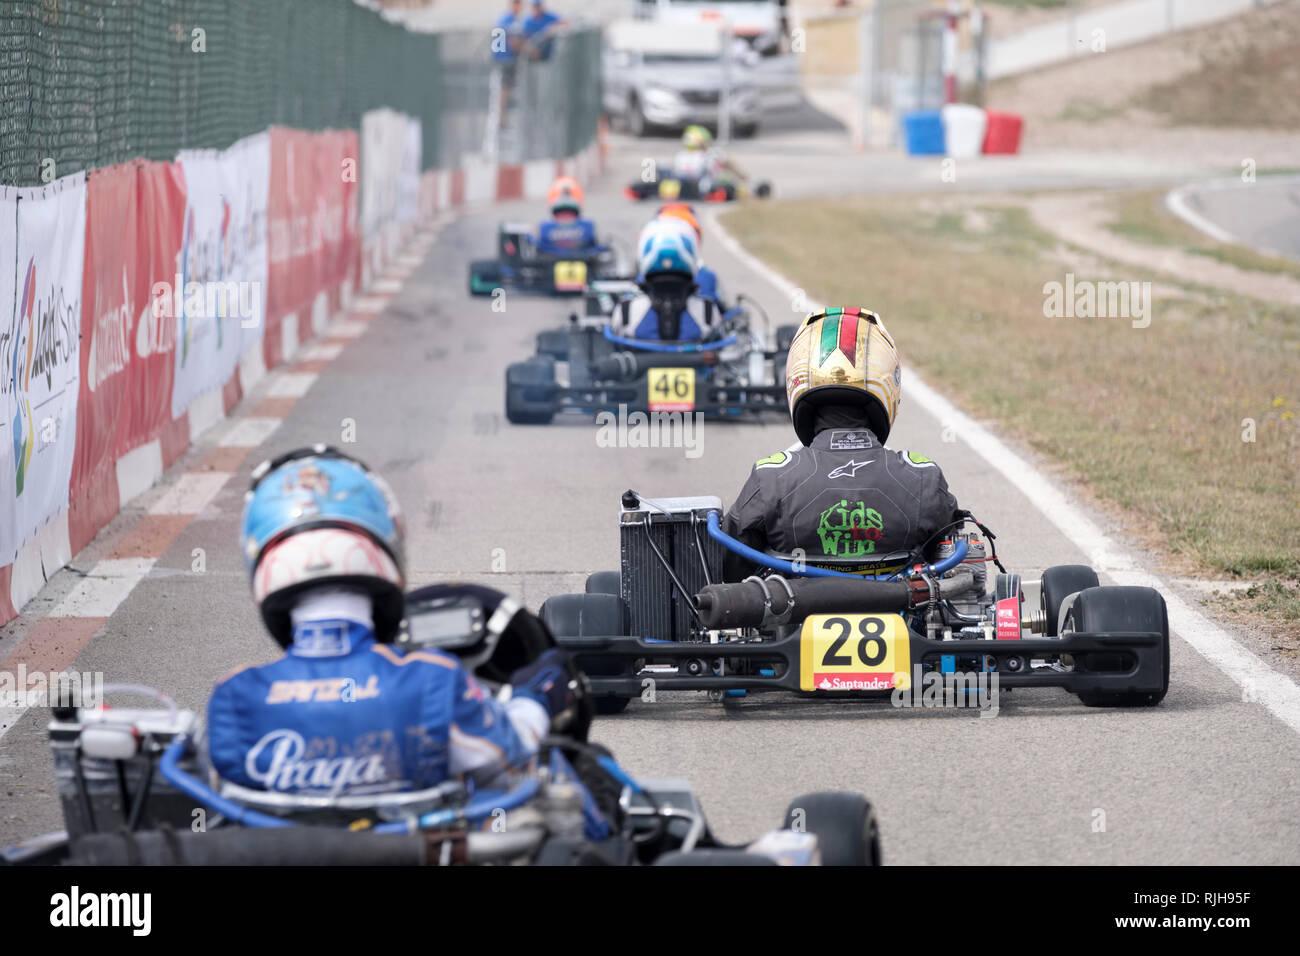 Junge Kartbahnen Treiber verlassen Paddock Rasse, Campillos, Malaga, Spanien zu beginnen, Stockbild